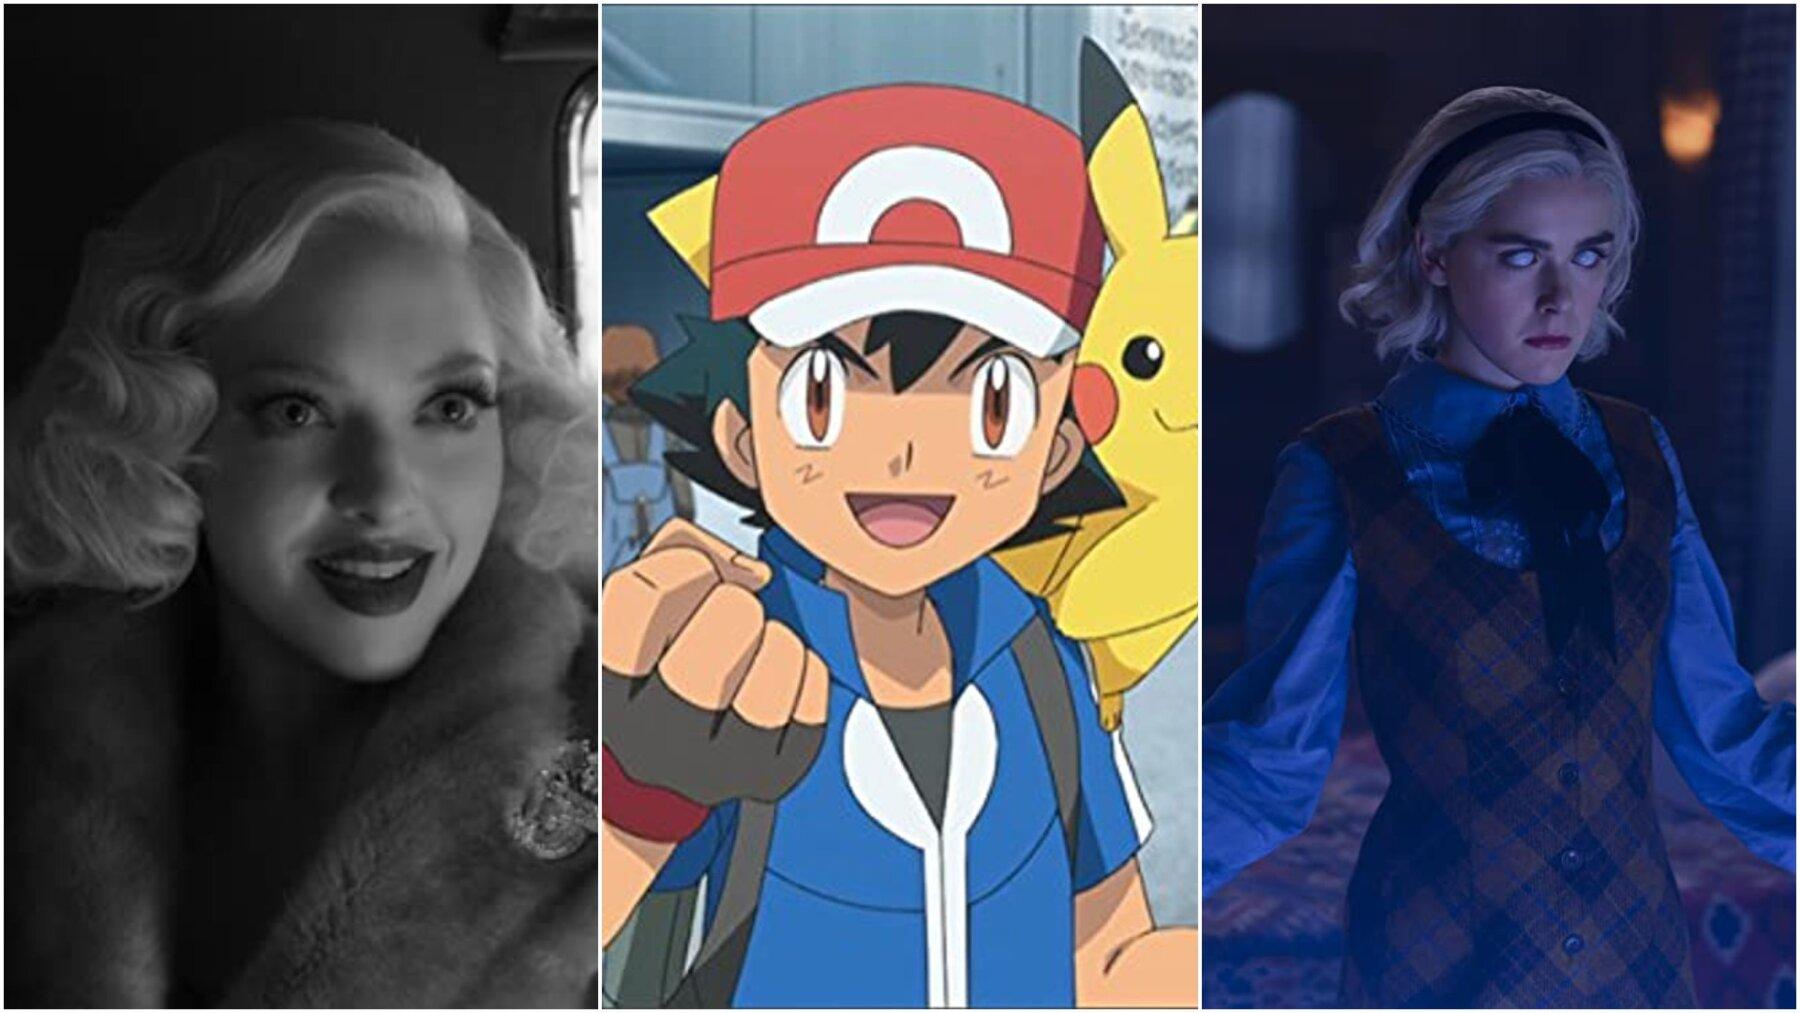 Netflix Christmas 2020 (c) Netflix International Pictures, The Pokémon Company International, & Netflix Streaming Services & Warner Bros. Television Distribution